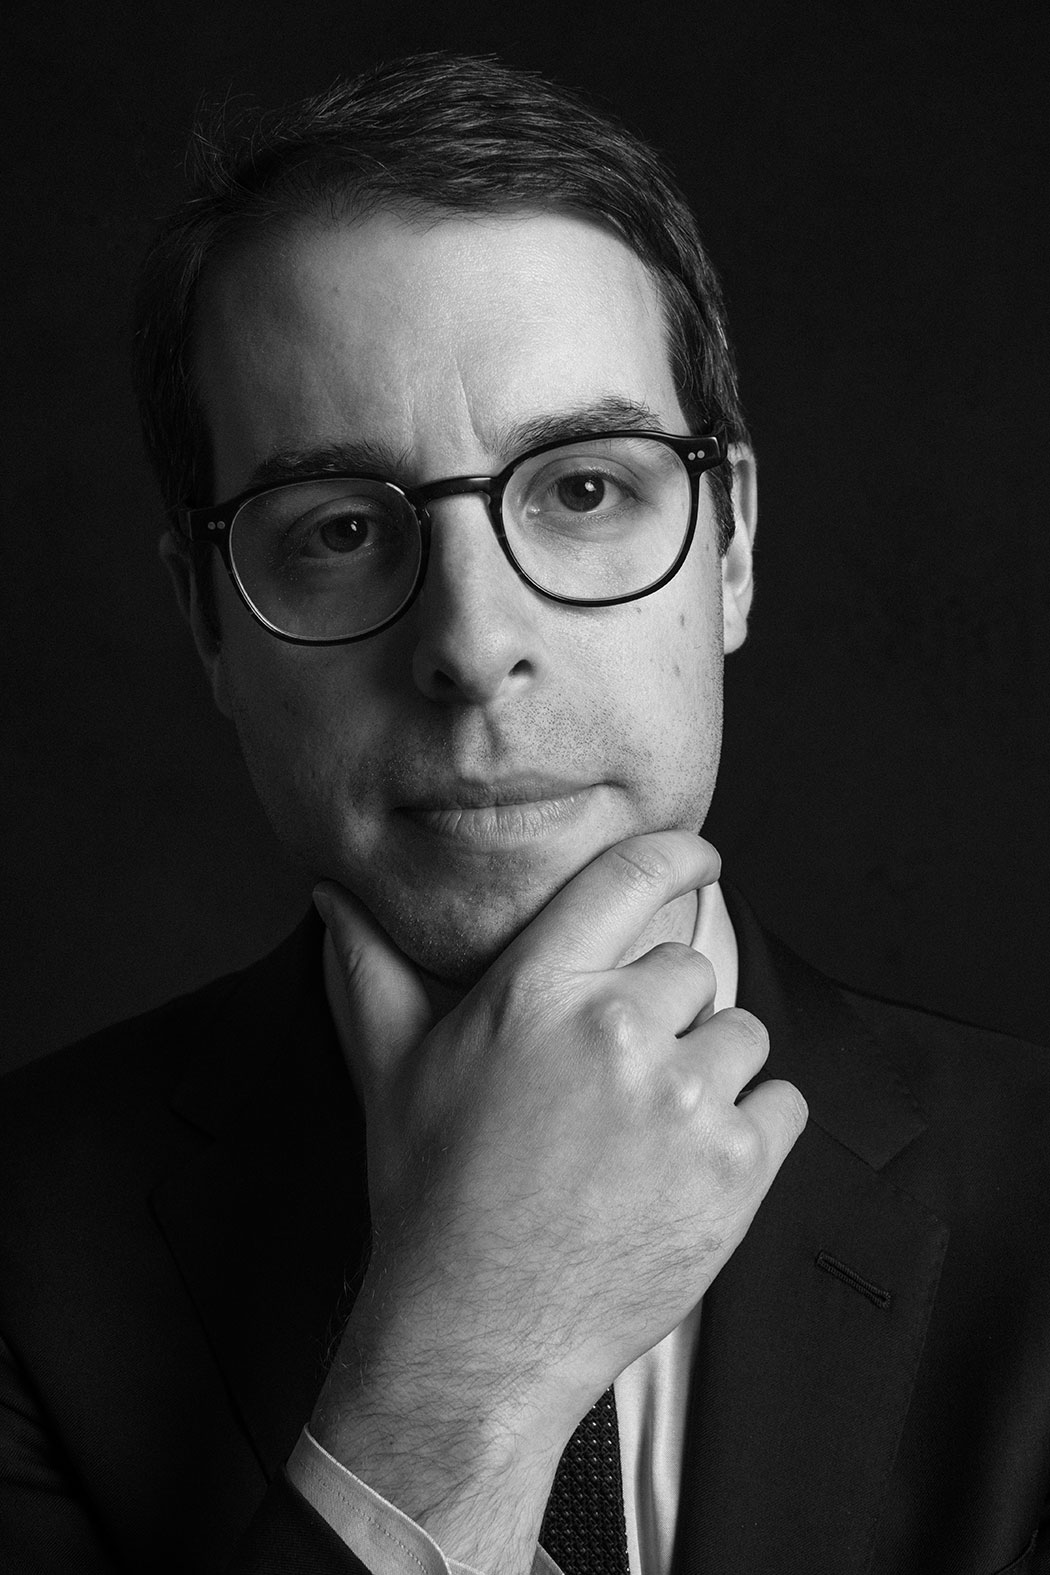 Adam Taubman